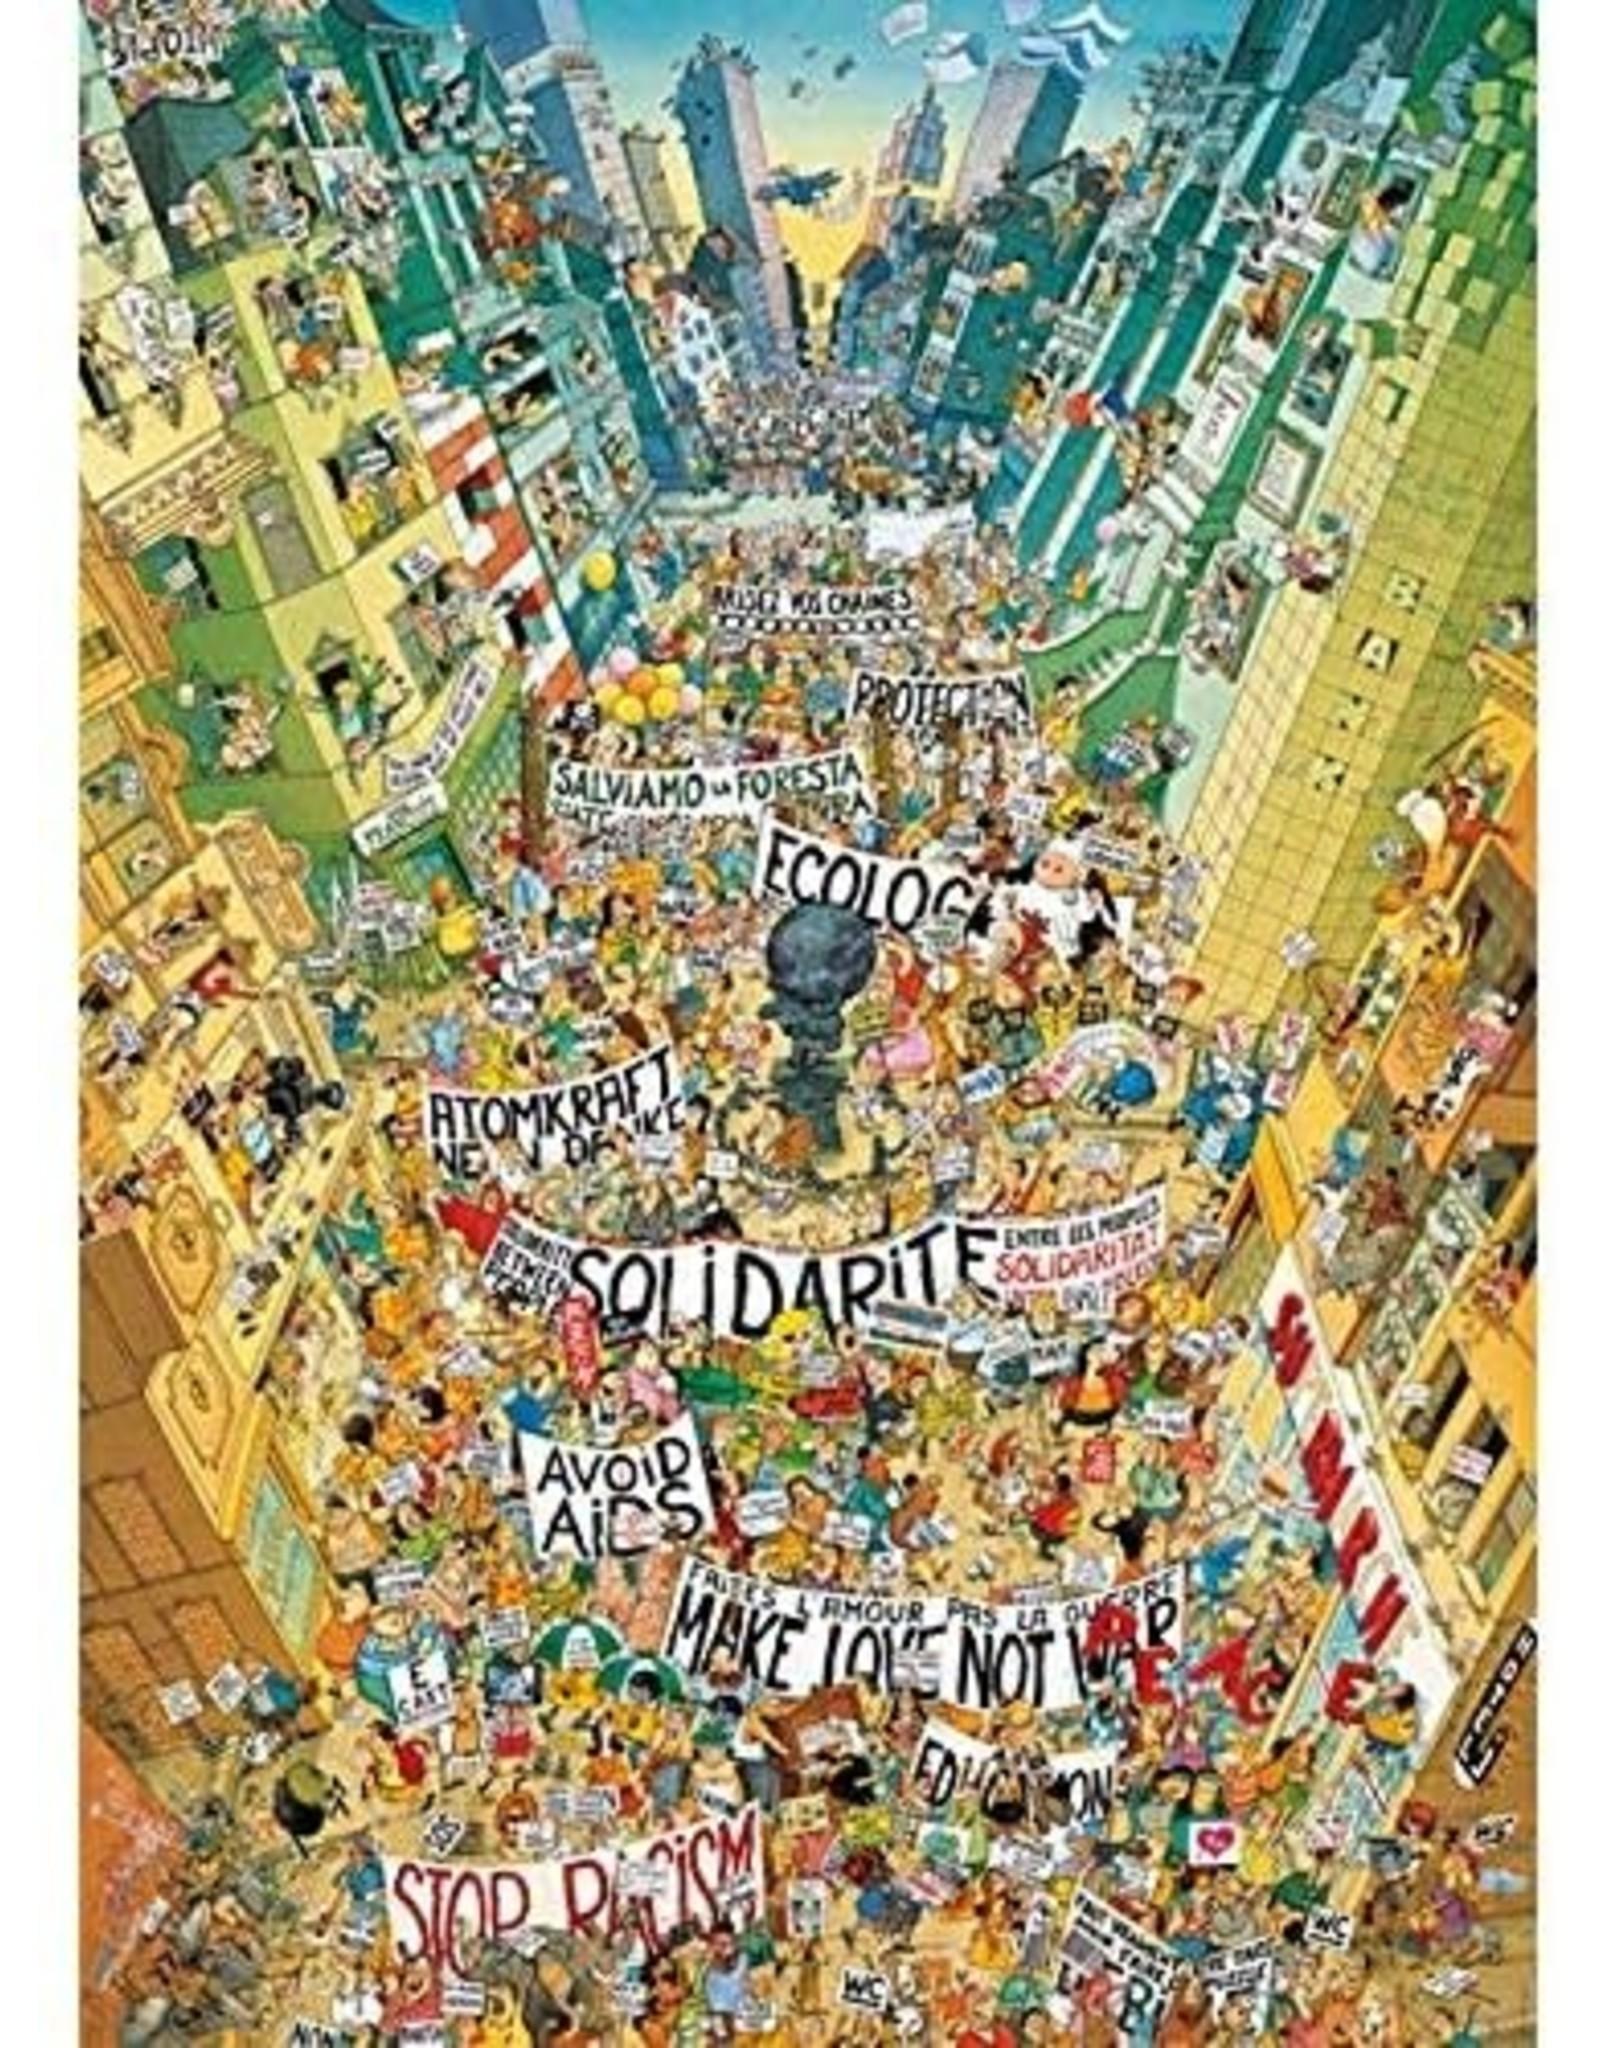 Protest! Degano, 2000mcx